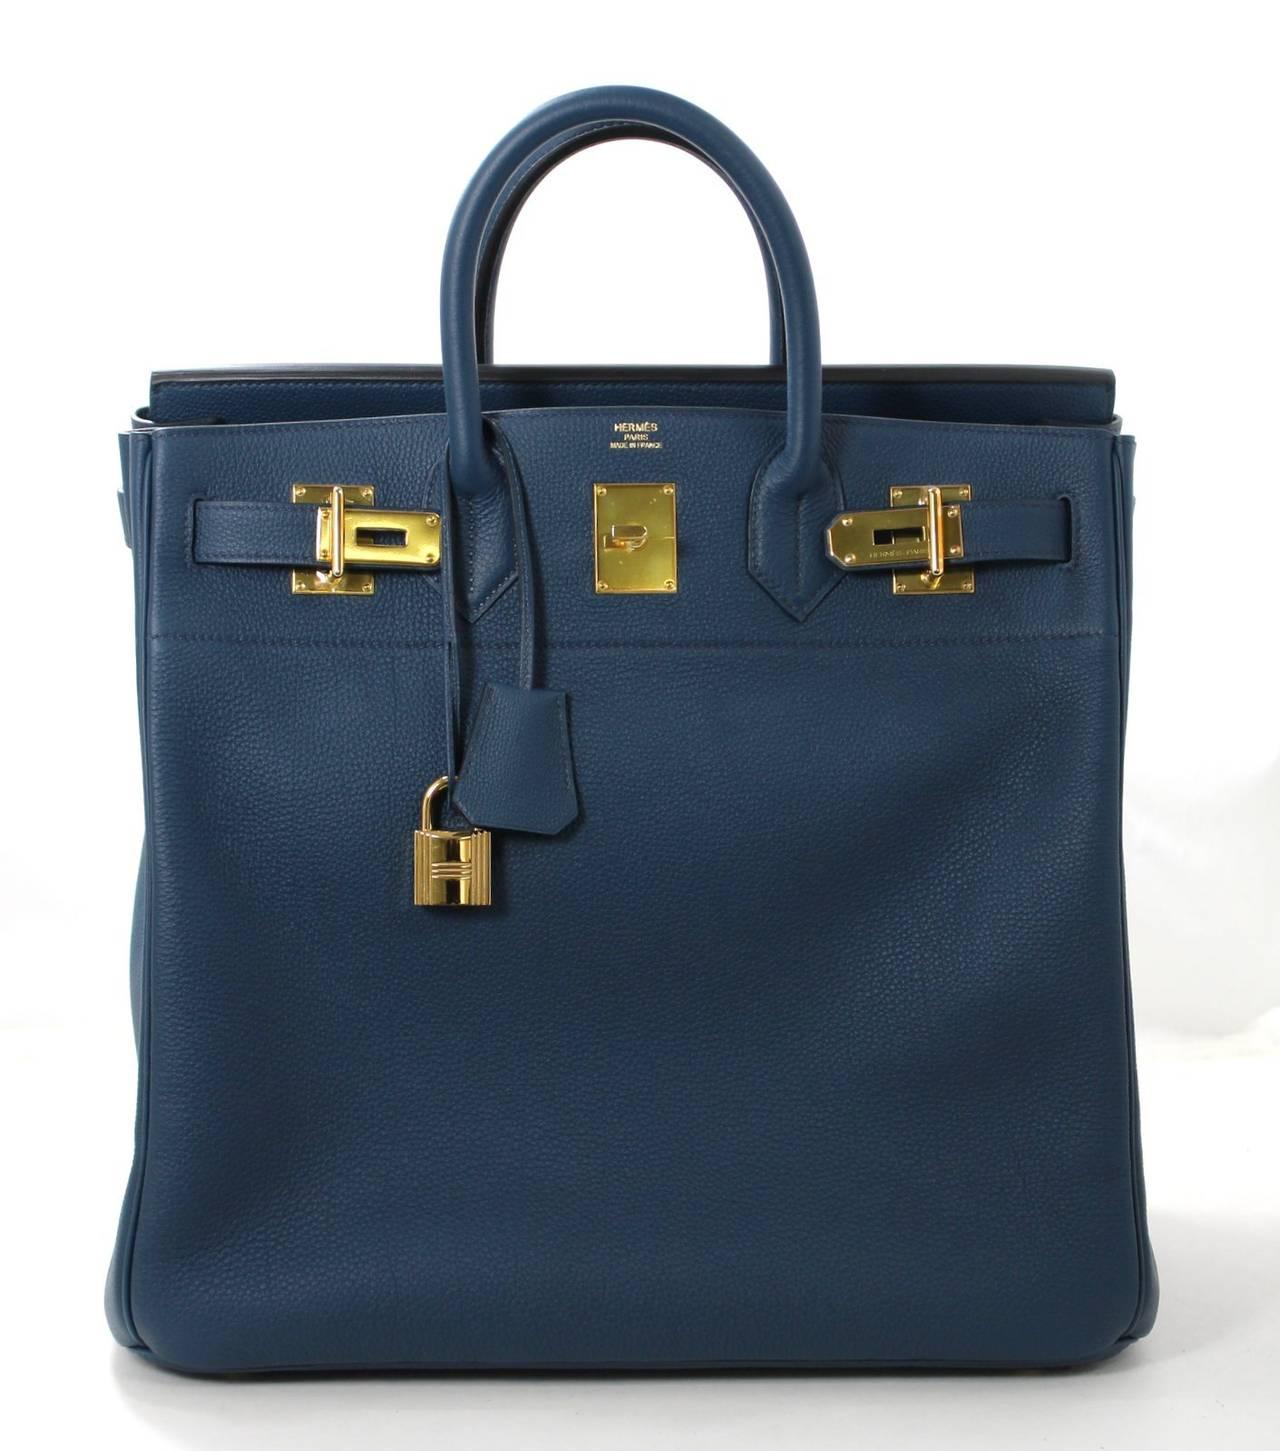 0c472344917 hermes birkin bag for sale - Hermes Blue de Prusse BLUE Togo HAC Haut a  Courroies hermes birkin hac 40 ...